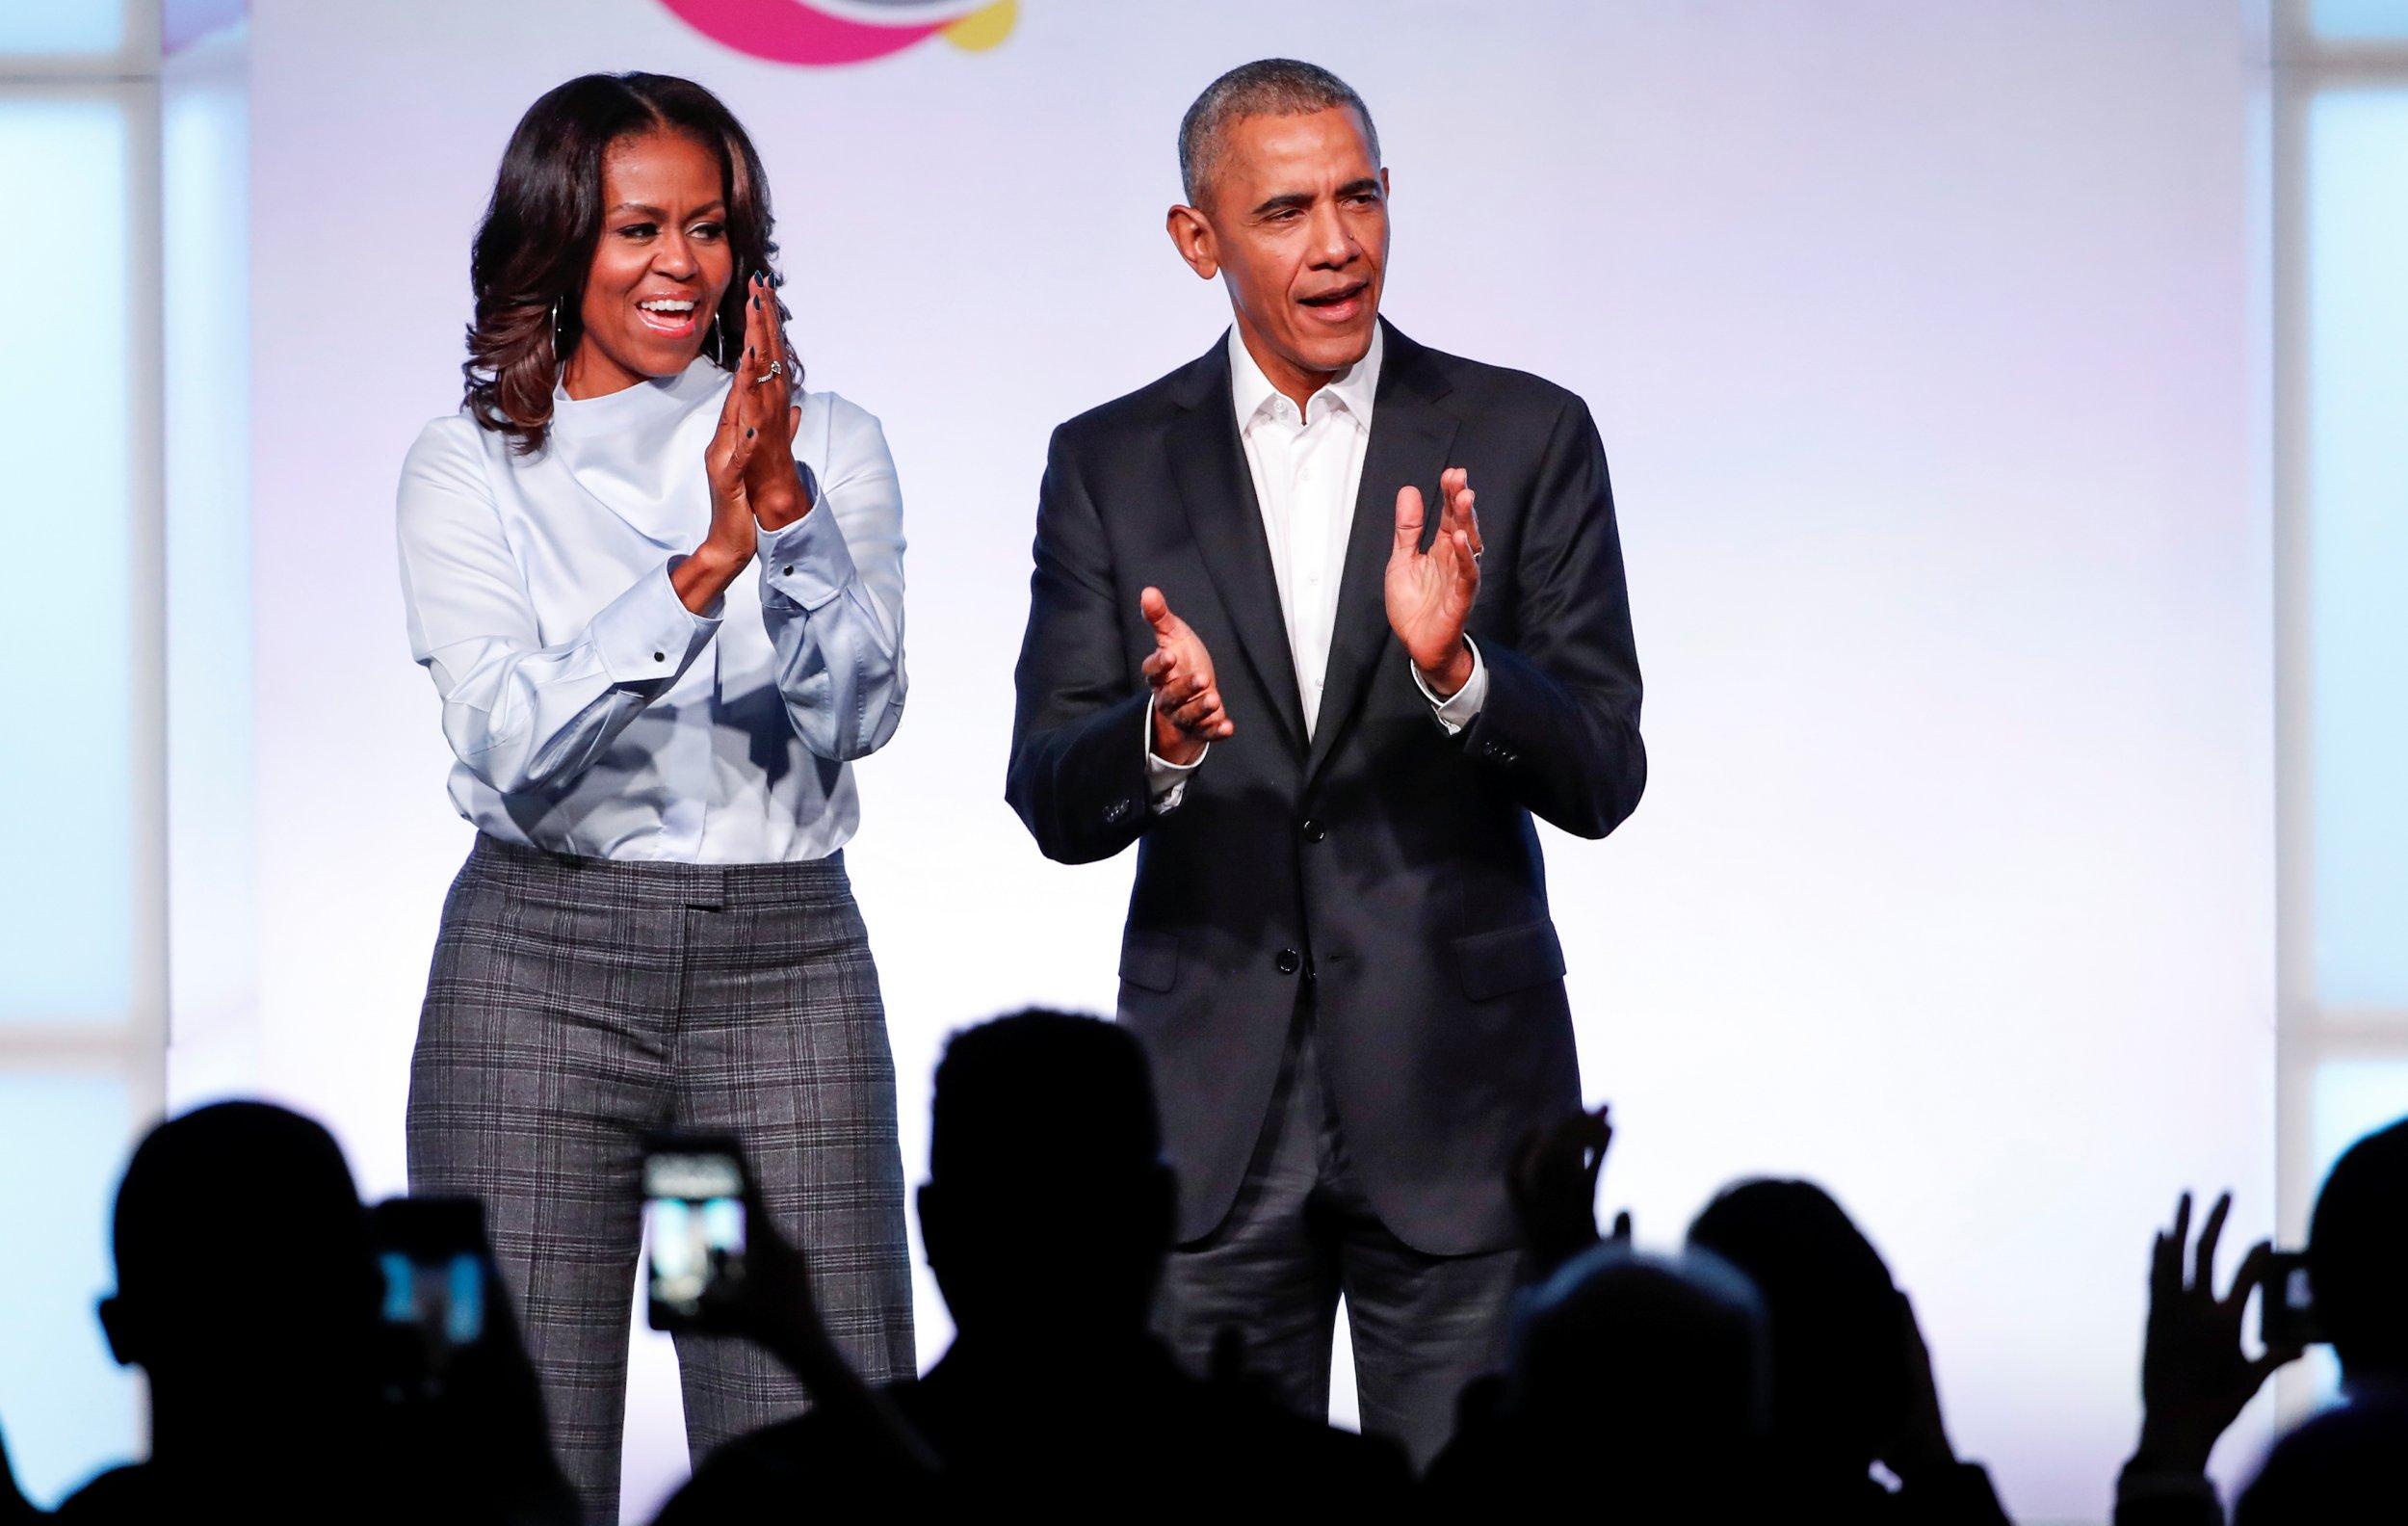 Obama Vs Trump Barack S Thanksgiving Tweet 10 Times More